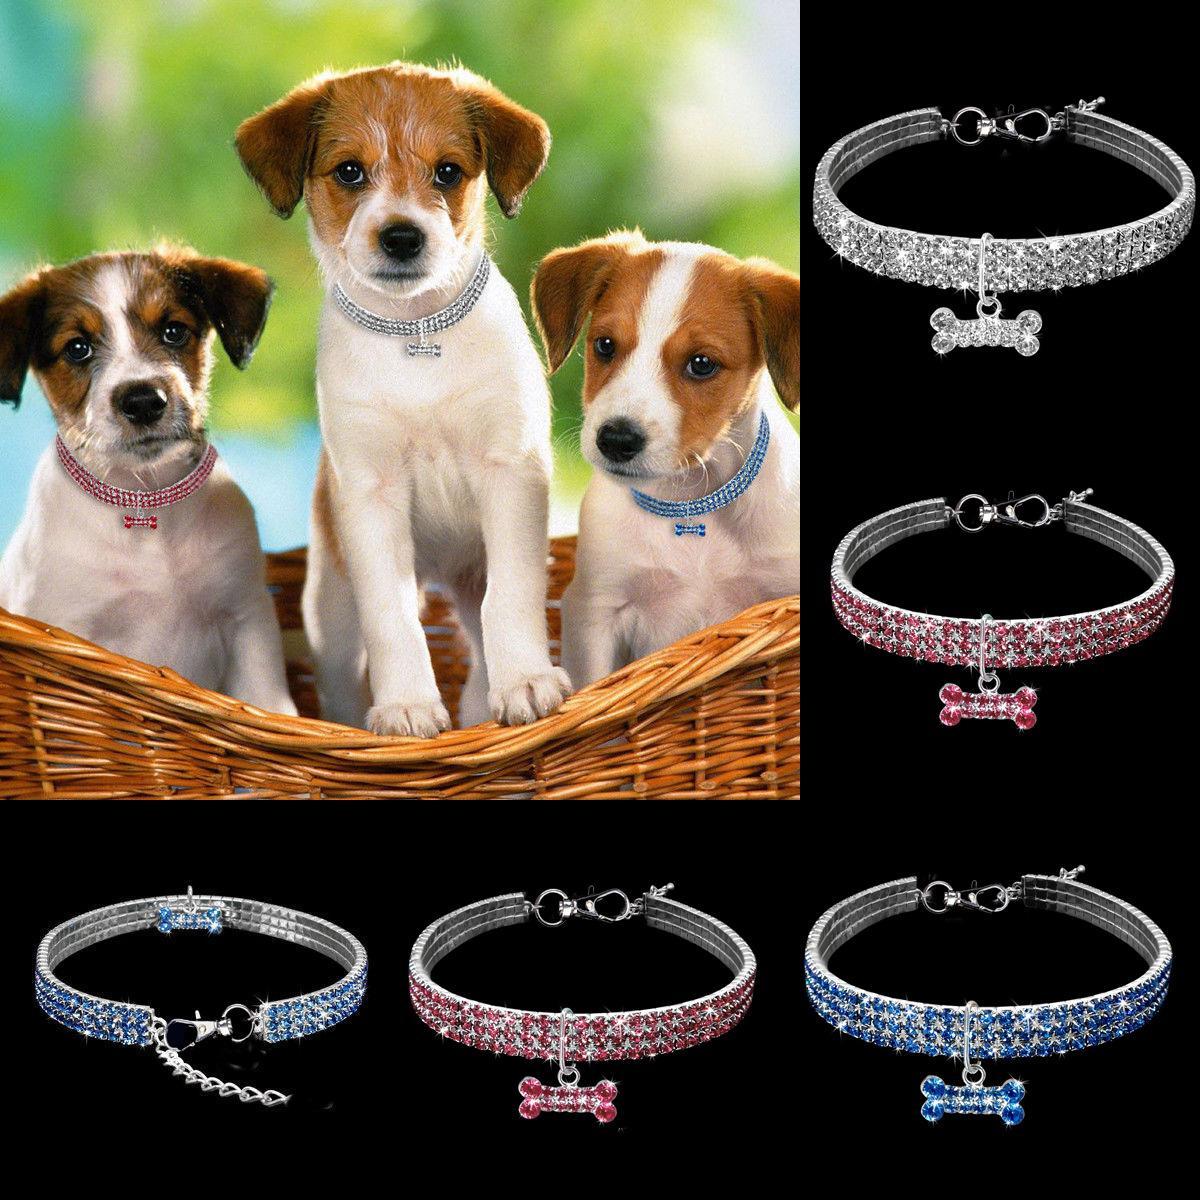 Shiny Rhinestone pet dog collar Crystal Puppy Pendant Bone Shape Kitten Puppy Leads Neck Strap Animal Pet Accessories Dog